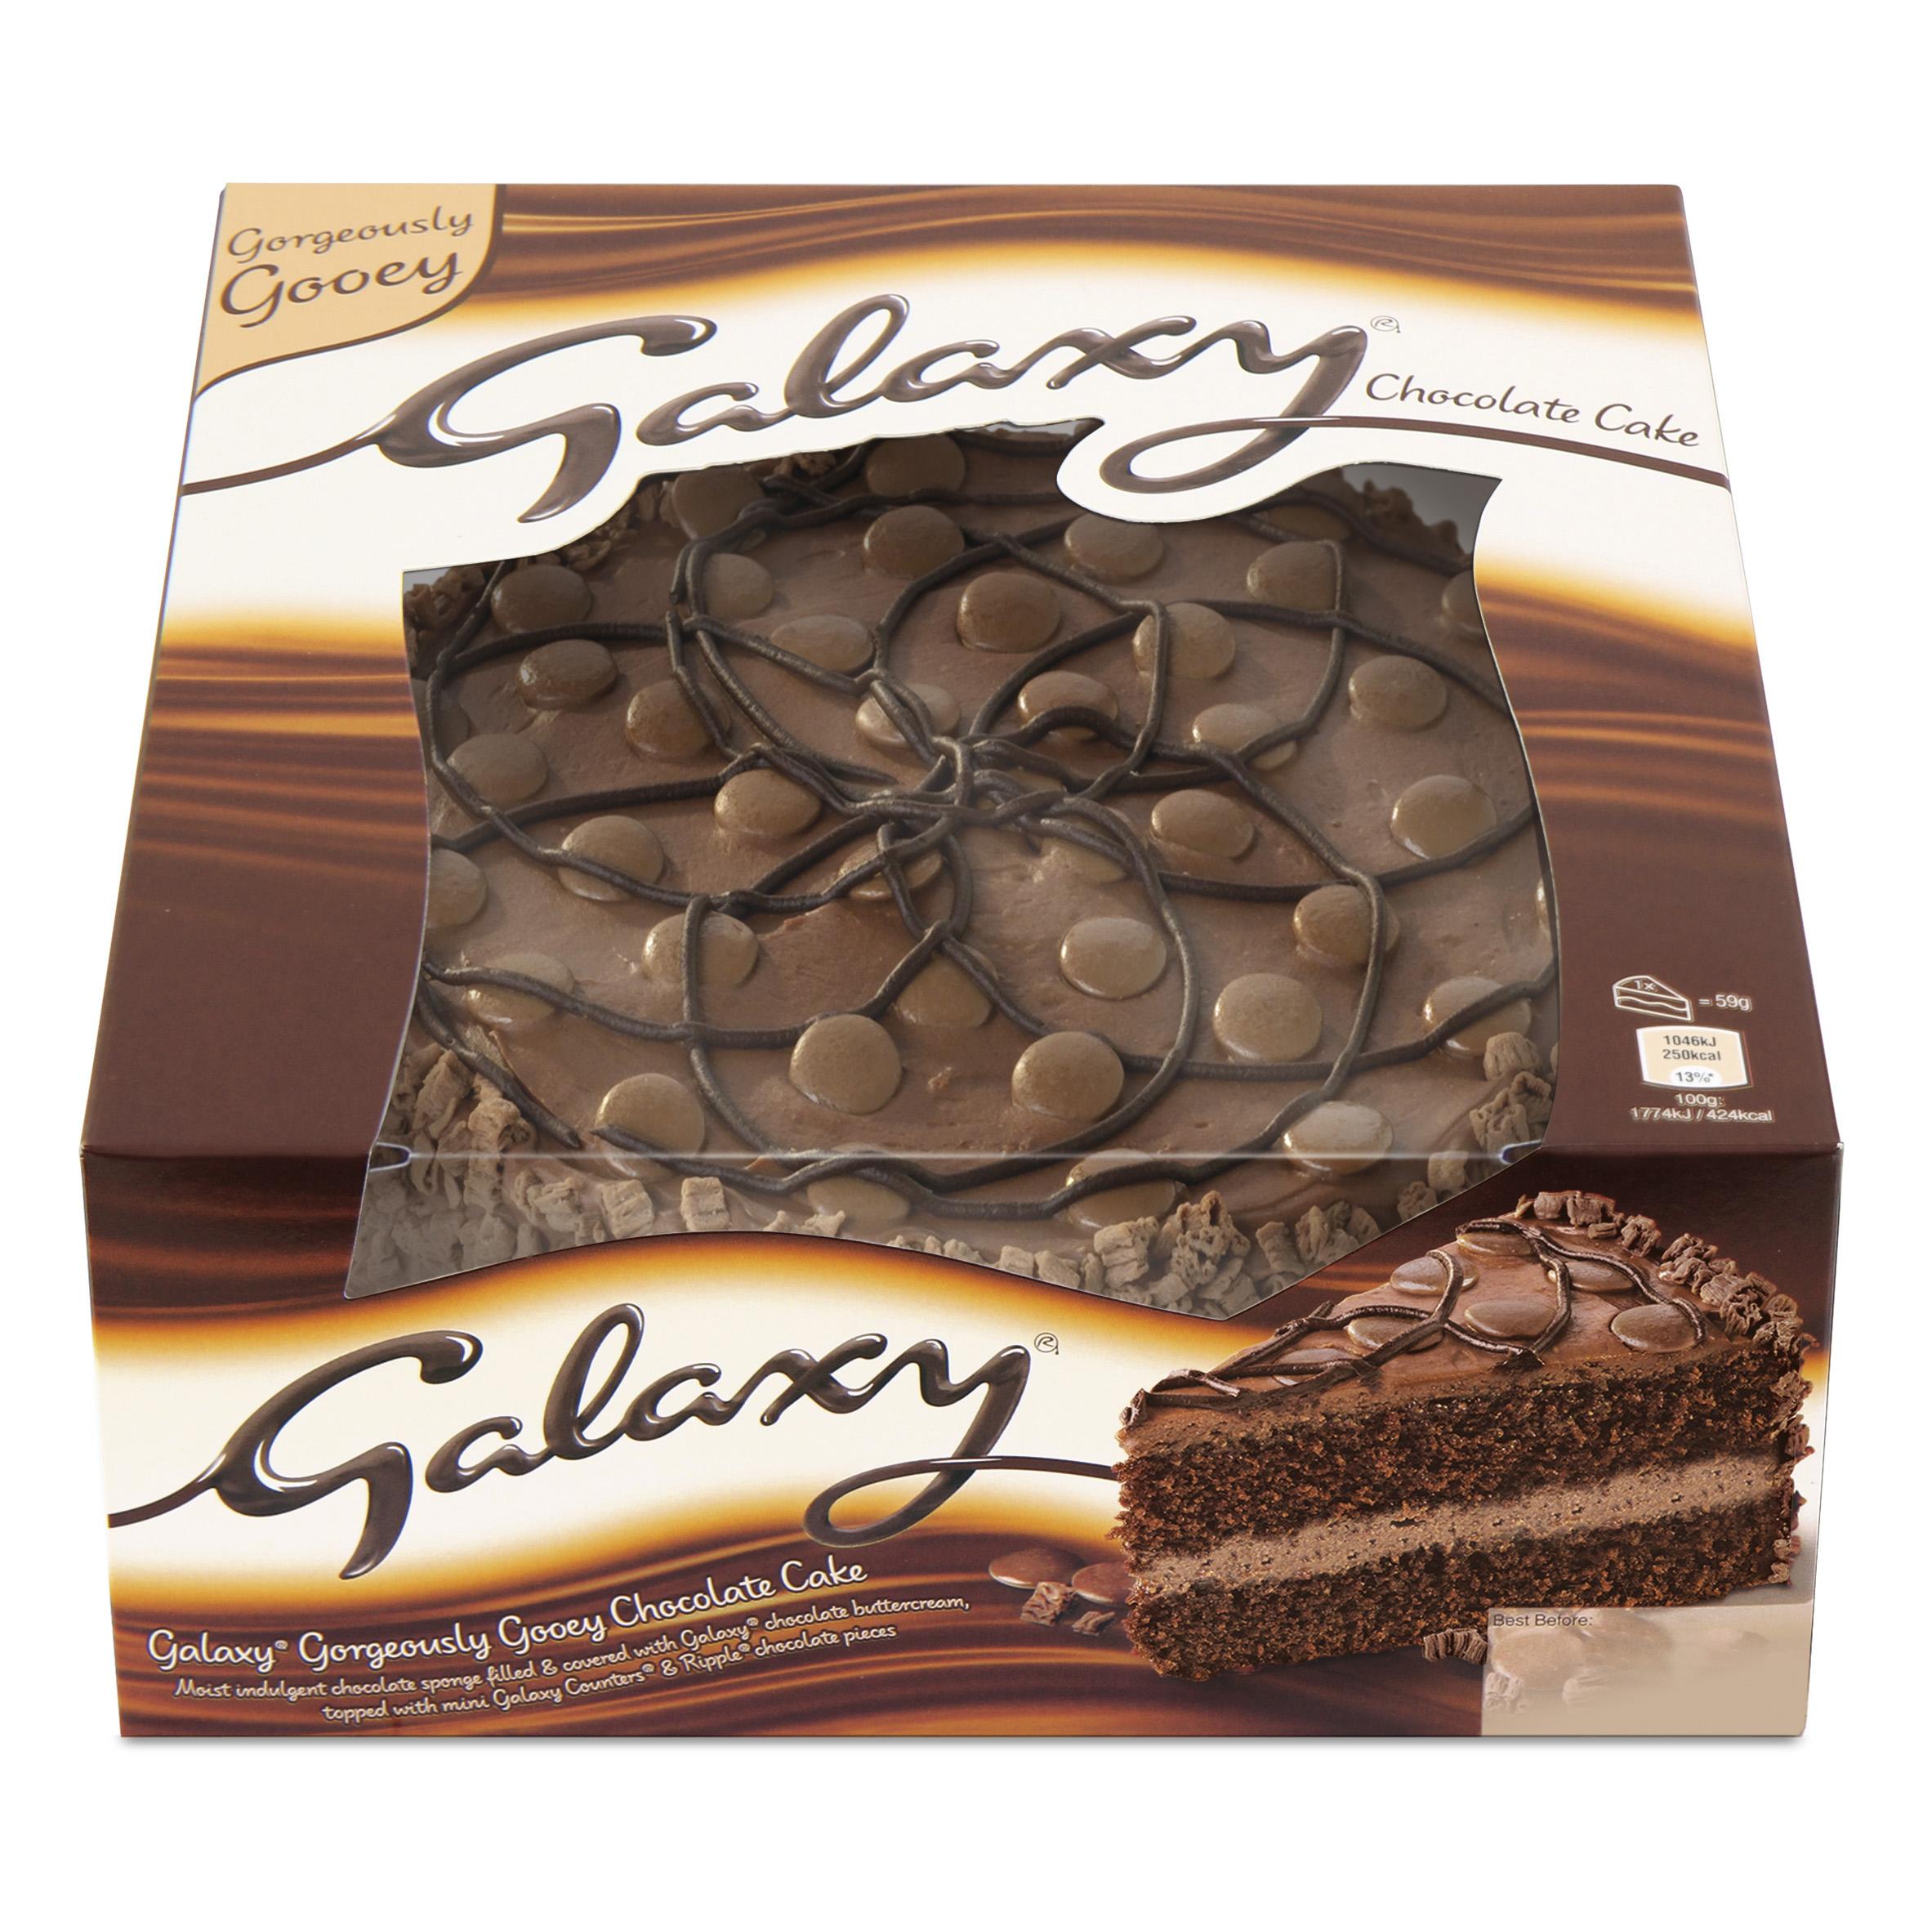 Galaxy Chocolate Birthday Cake Asda Grocery Gems New Mars Cakes